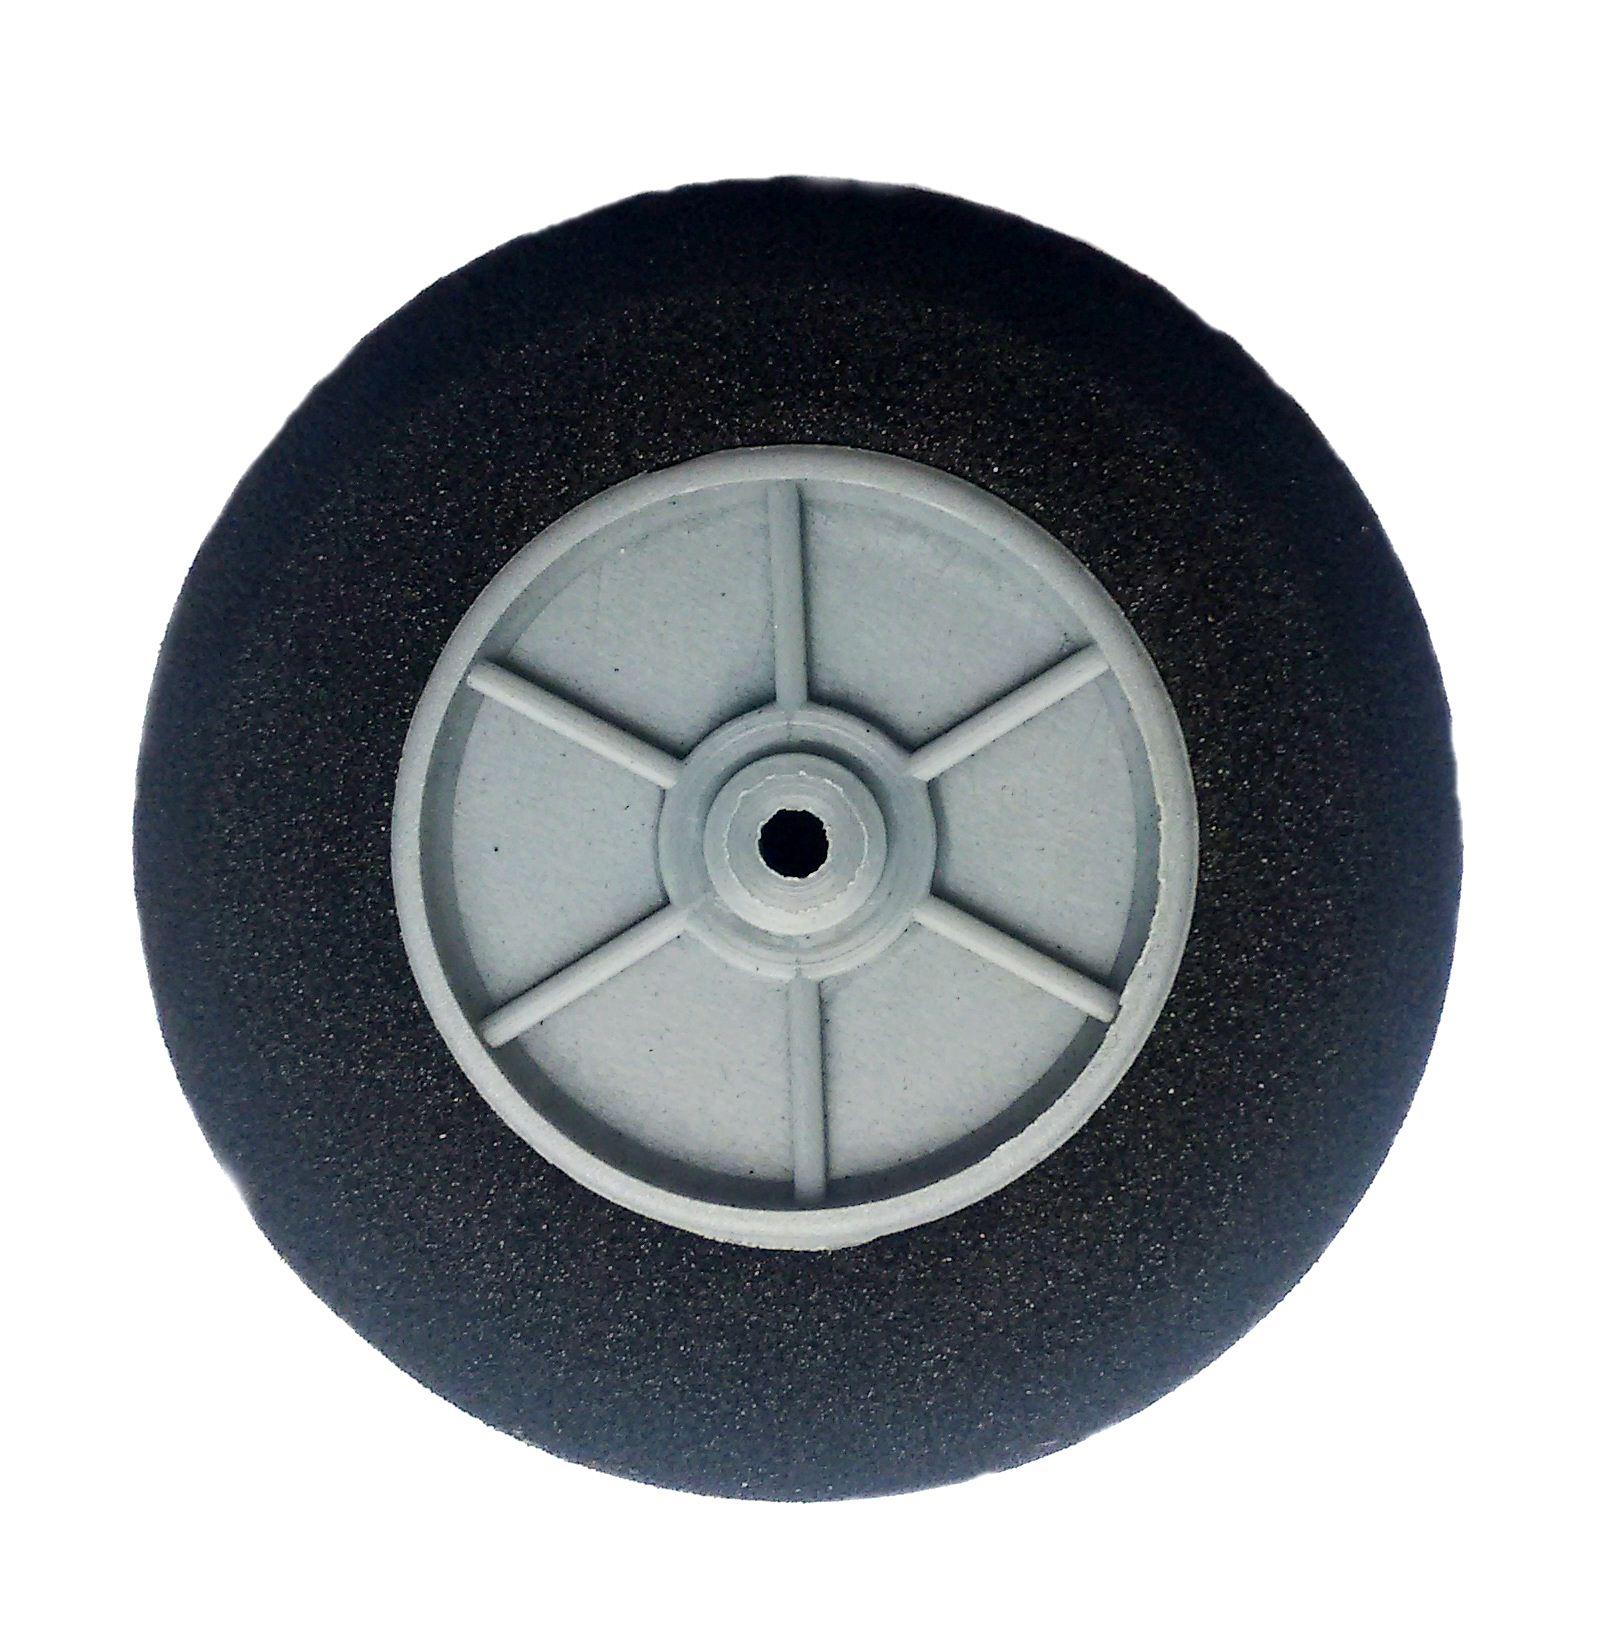 9850 - Roda Light Foam (Diâmetro: 60mm, Largura: 18,5mm)